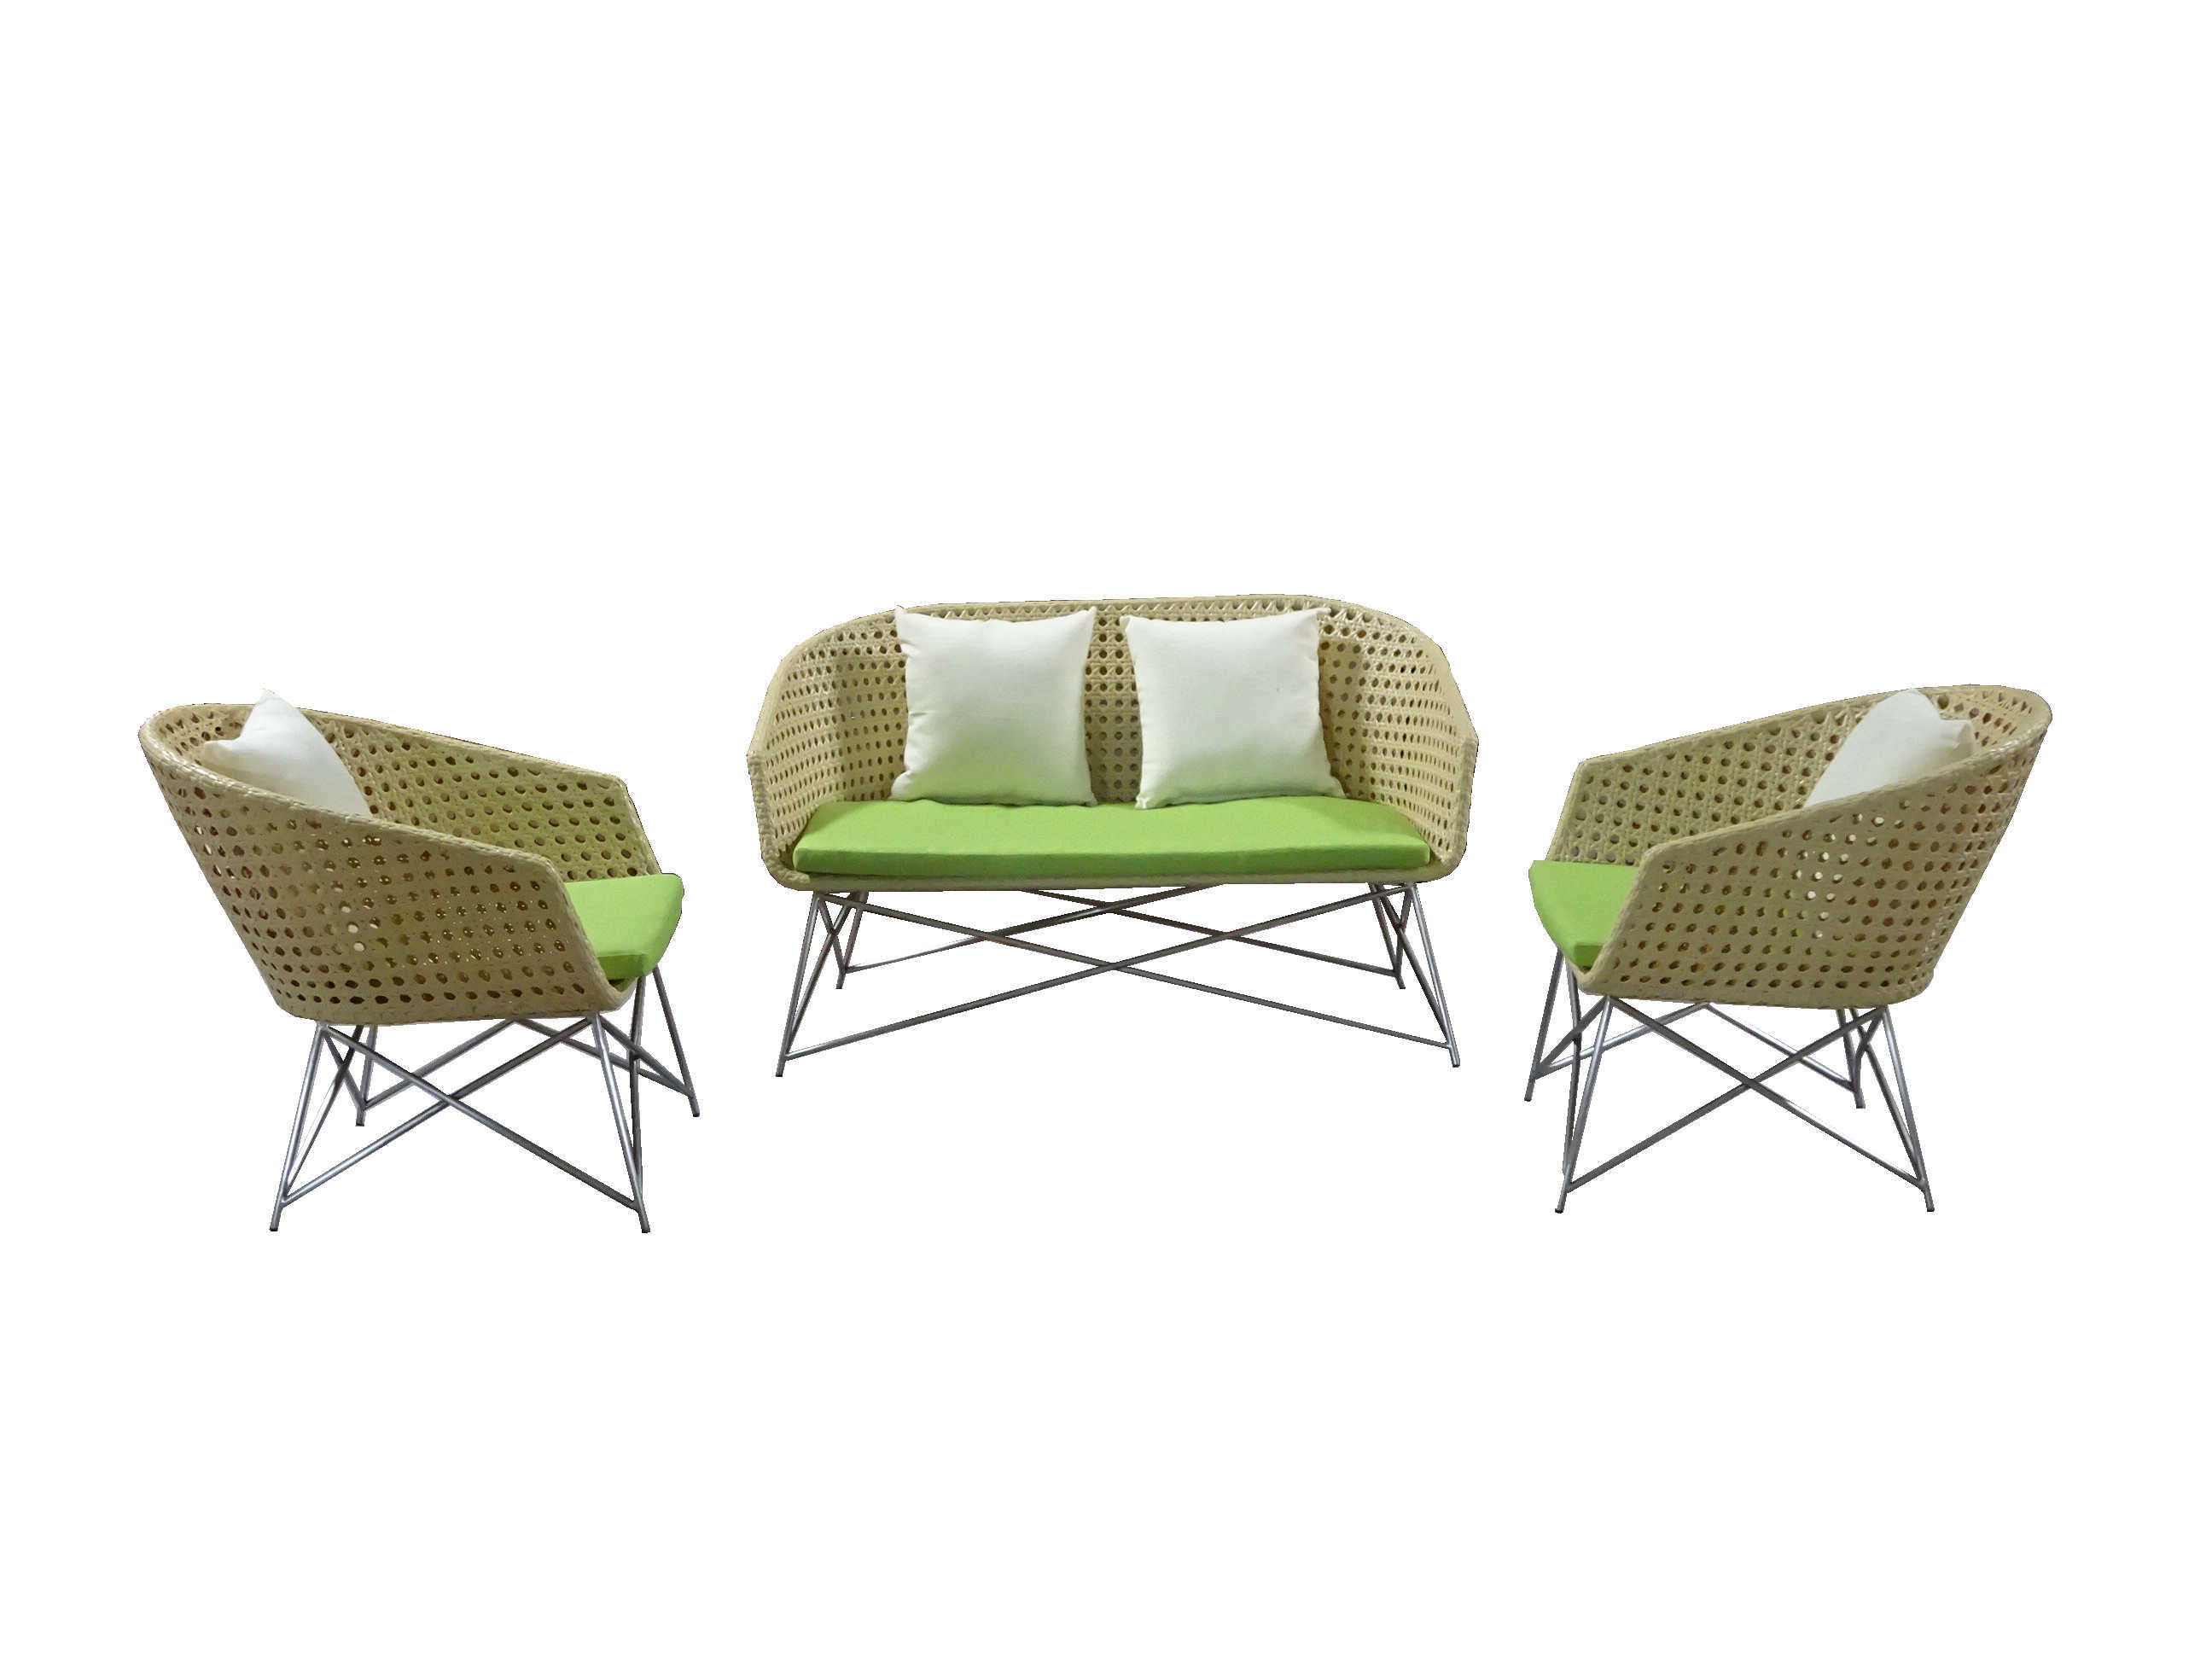 New Design Outdoor Furniture Sofa Set Garden Furniture Stainless Steel Sofa Set